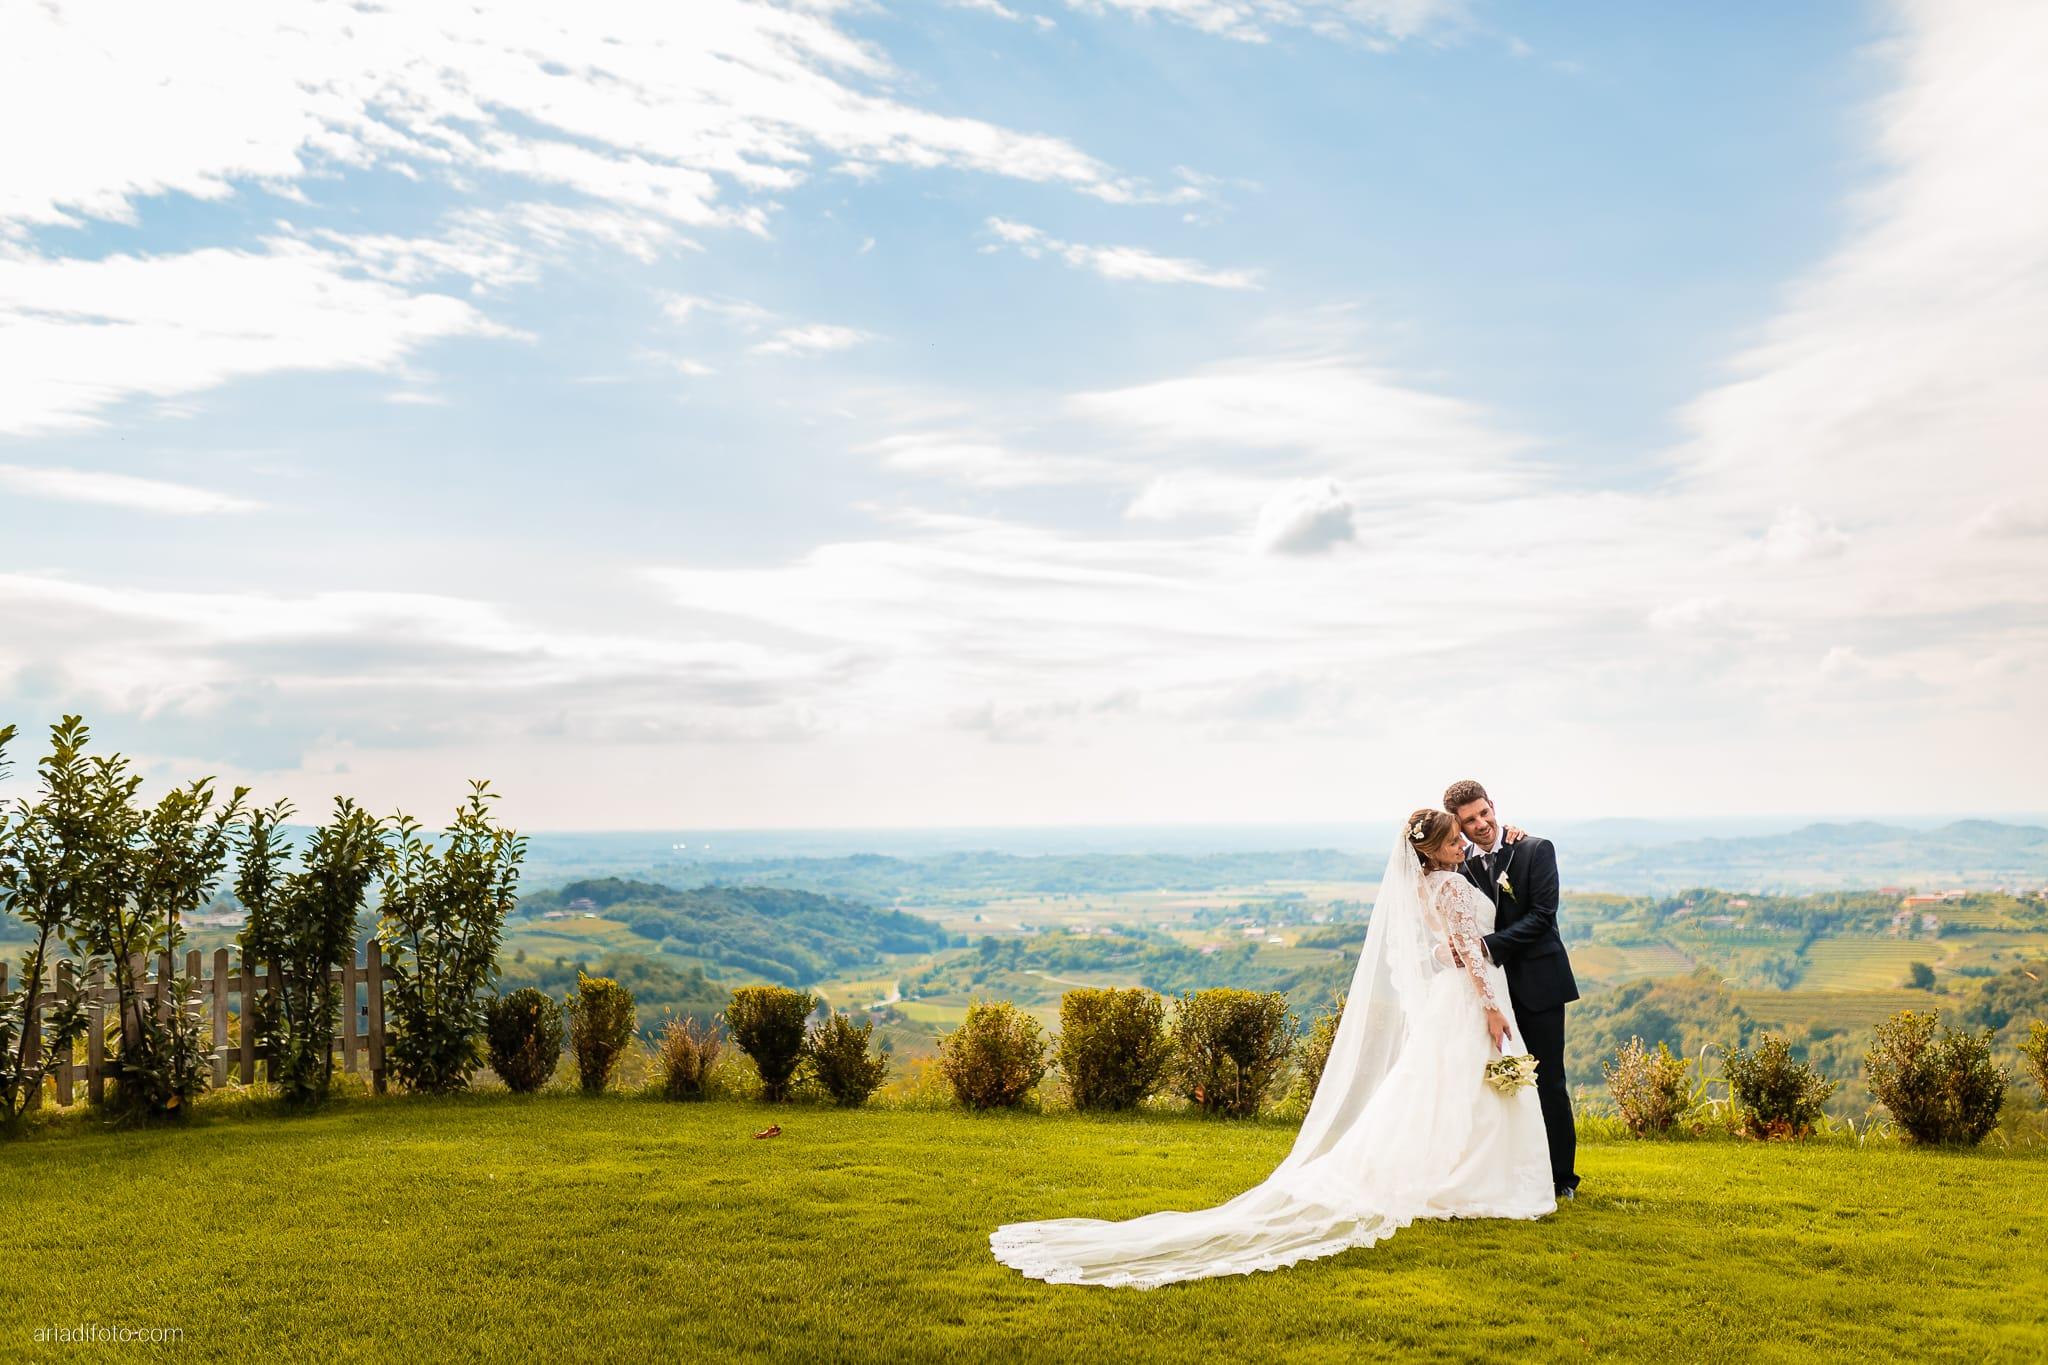 Eleonora Elia Matrimonio Tarcento Udine Baronesse Tacco Gorizia ritratti sposi